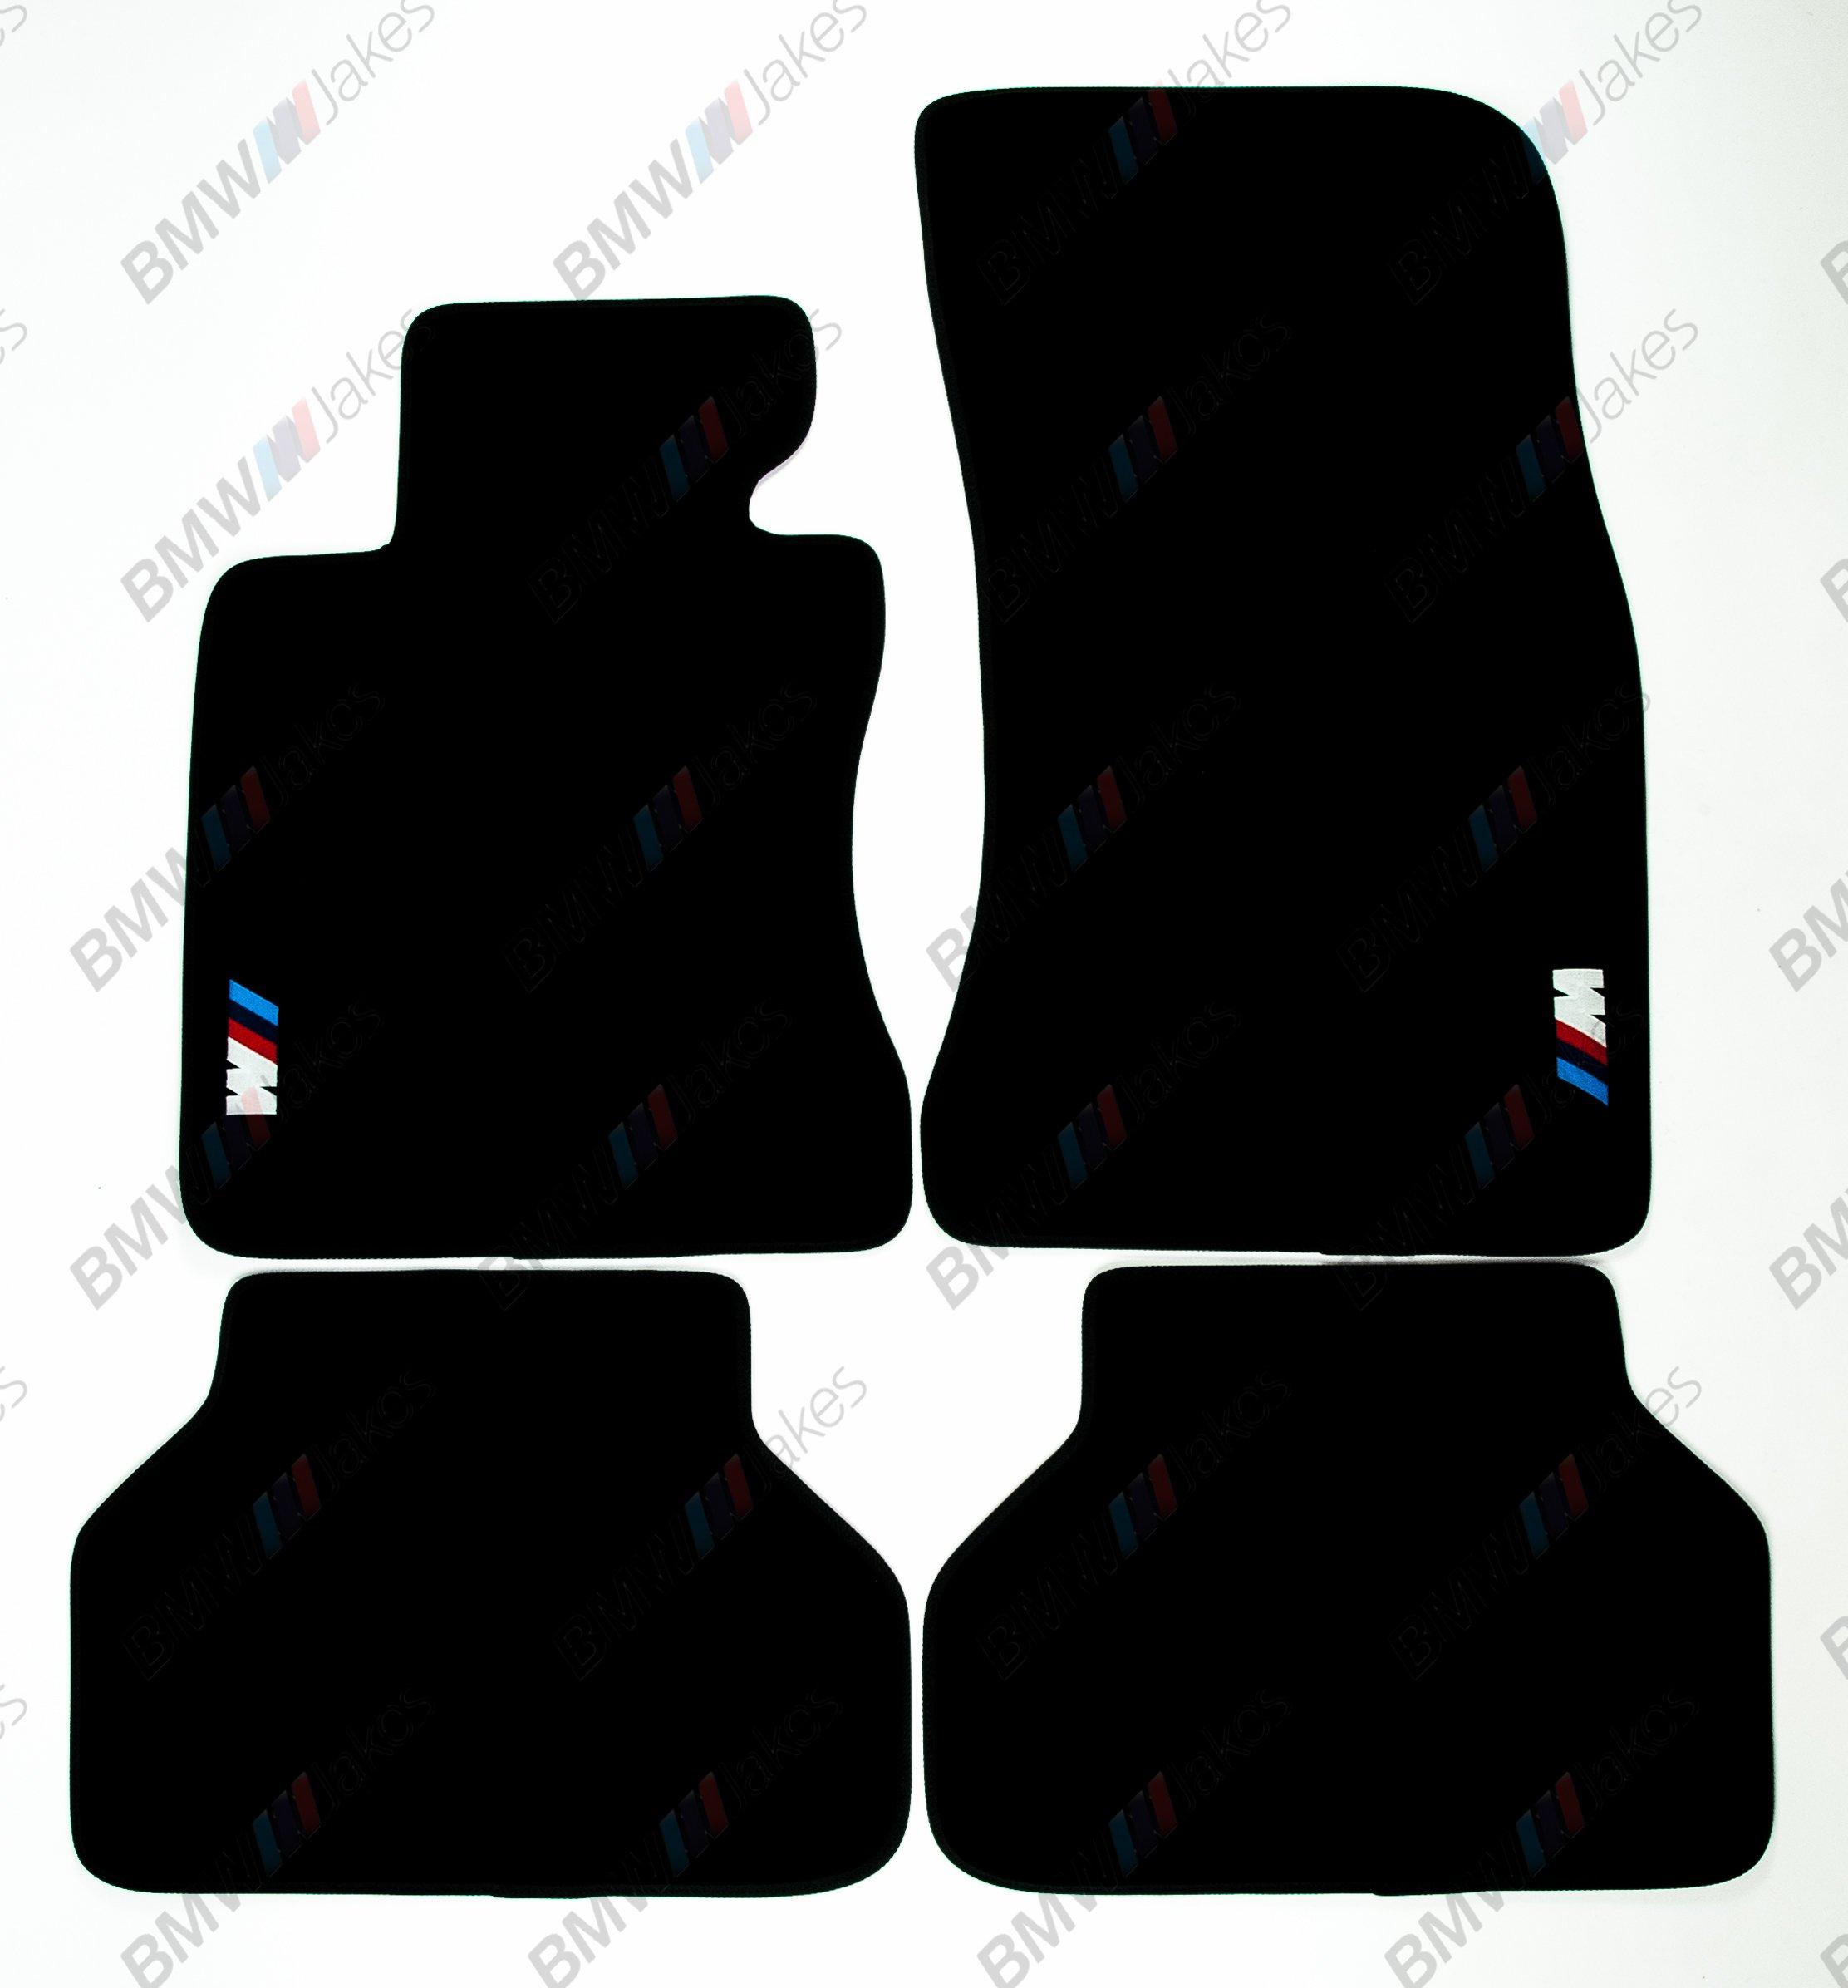 NEW CAR FLOOR MATS BLACK with ///M EMBLEM for BMW 5 series E60 2004 - 2009